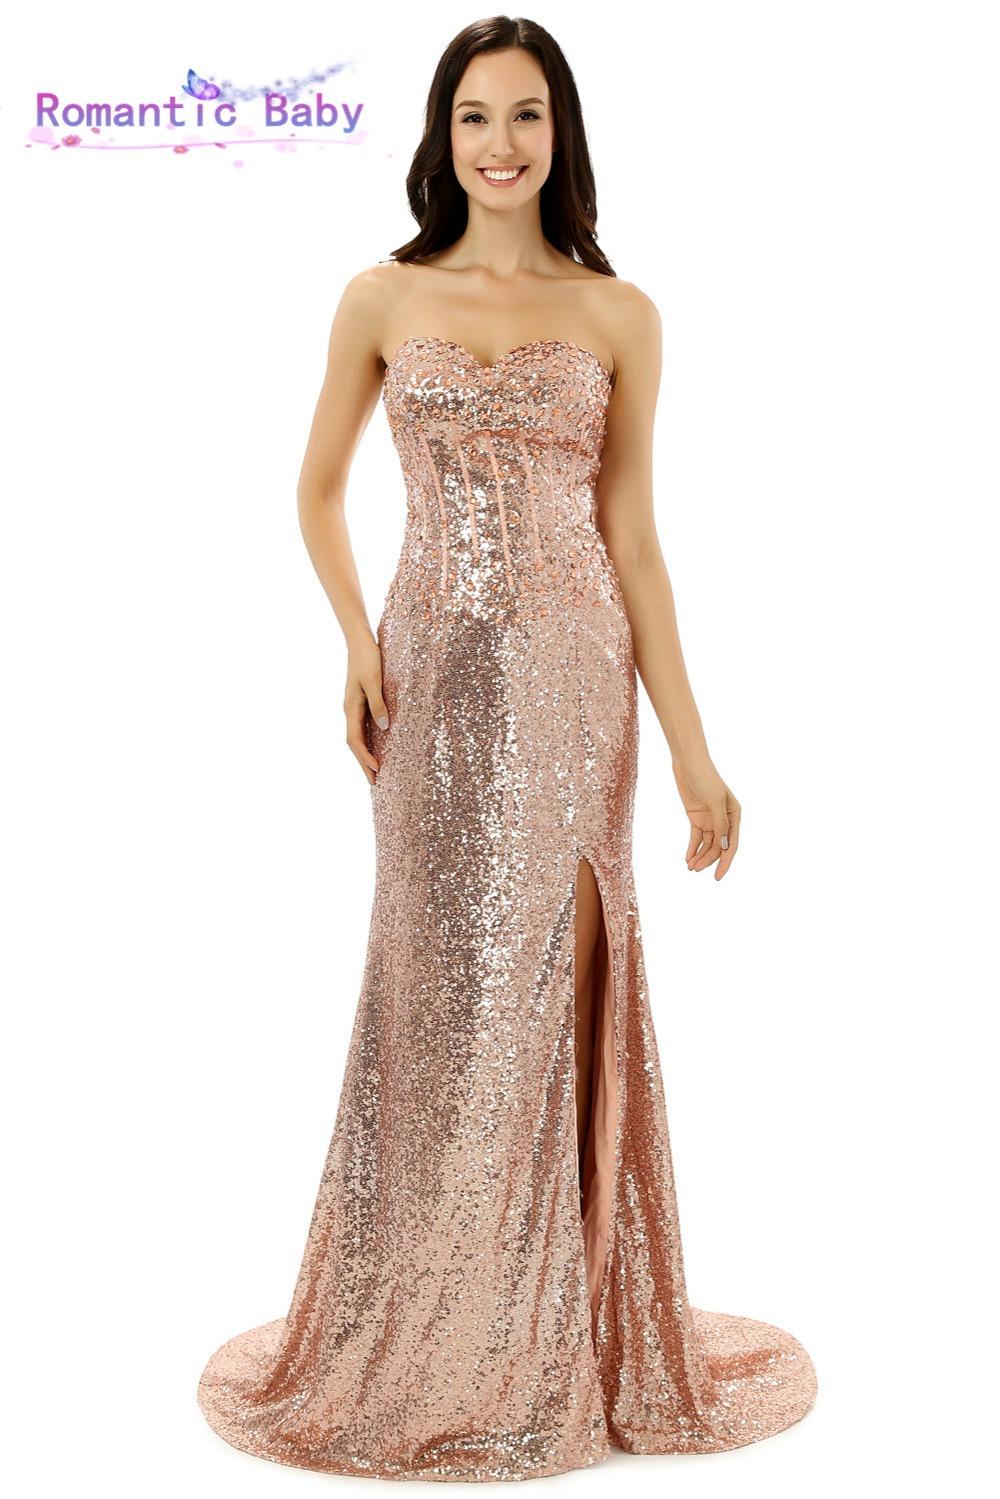 Gold Sequin Prom Dresses Cheap - Boutique Prom Dresses